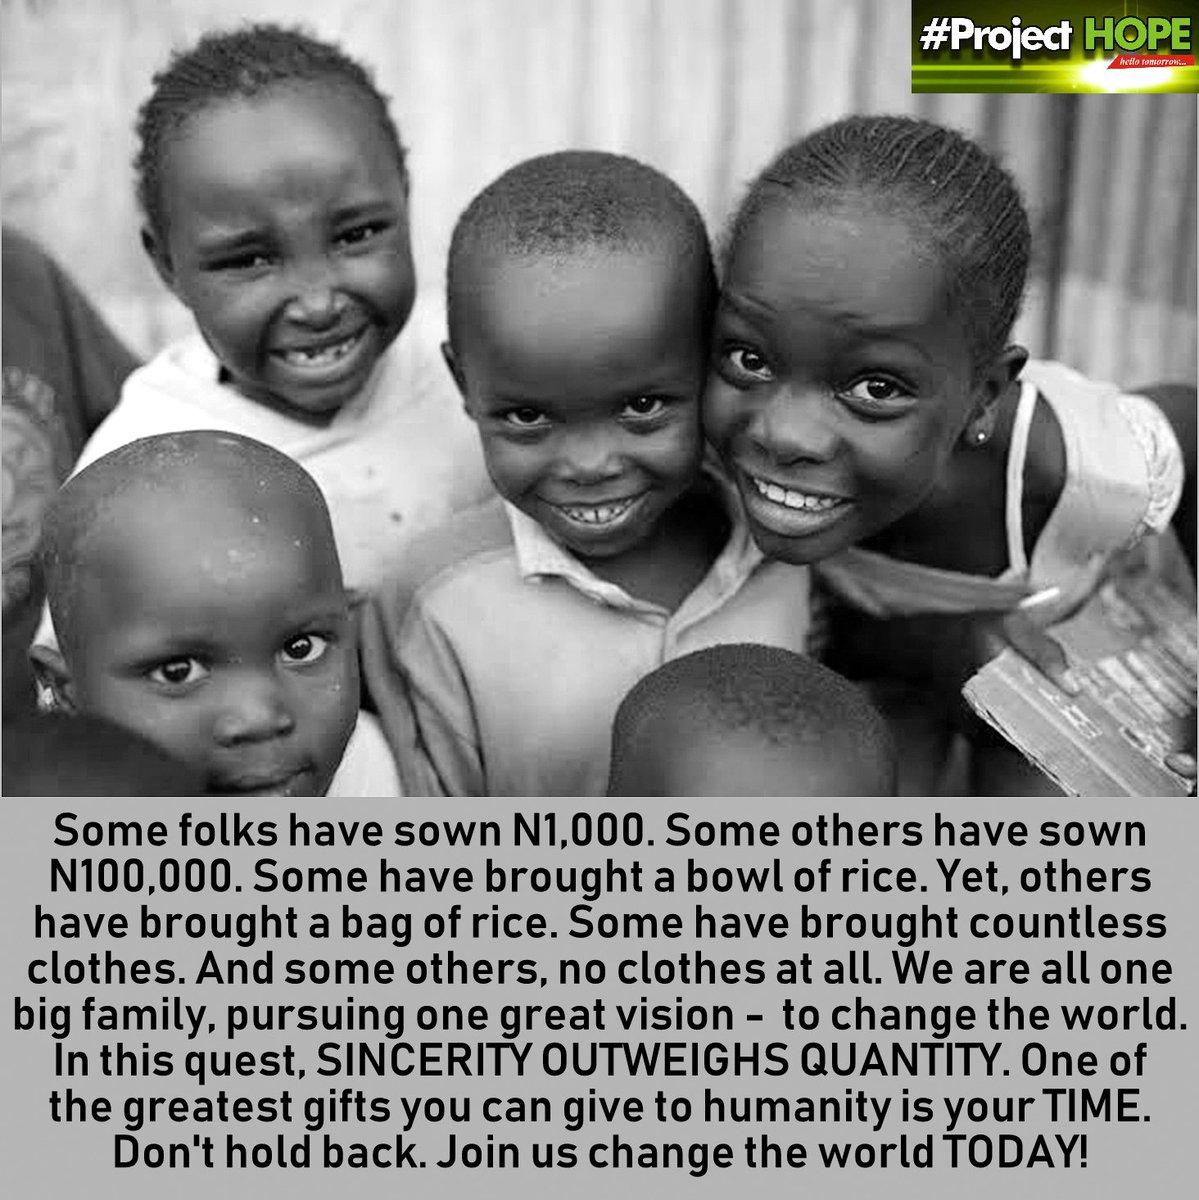 #ProjectHope #forhumanity #love #hope #support #share #donate #be #contribute #help #partner #volunteer #humanitarian #philantropist #hellotomorrow #kubwa #forthosewholive #getinvolved #joinus #gothere #changetheworld ❤